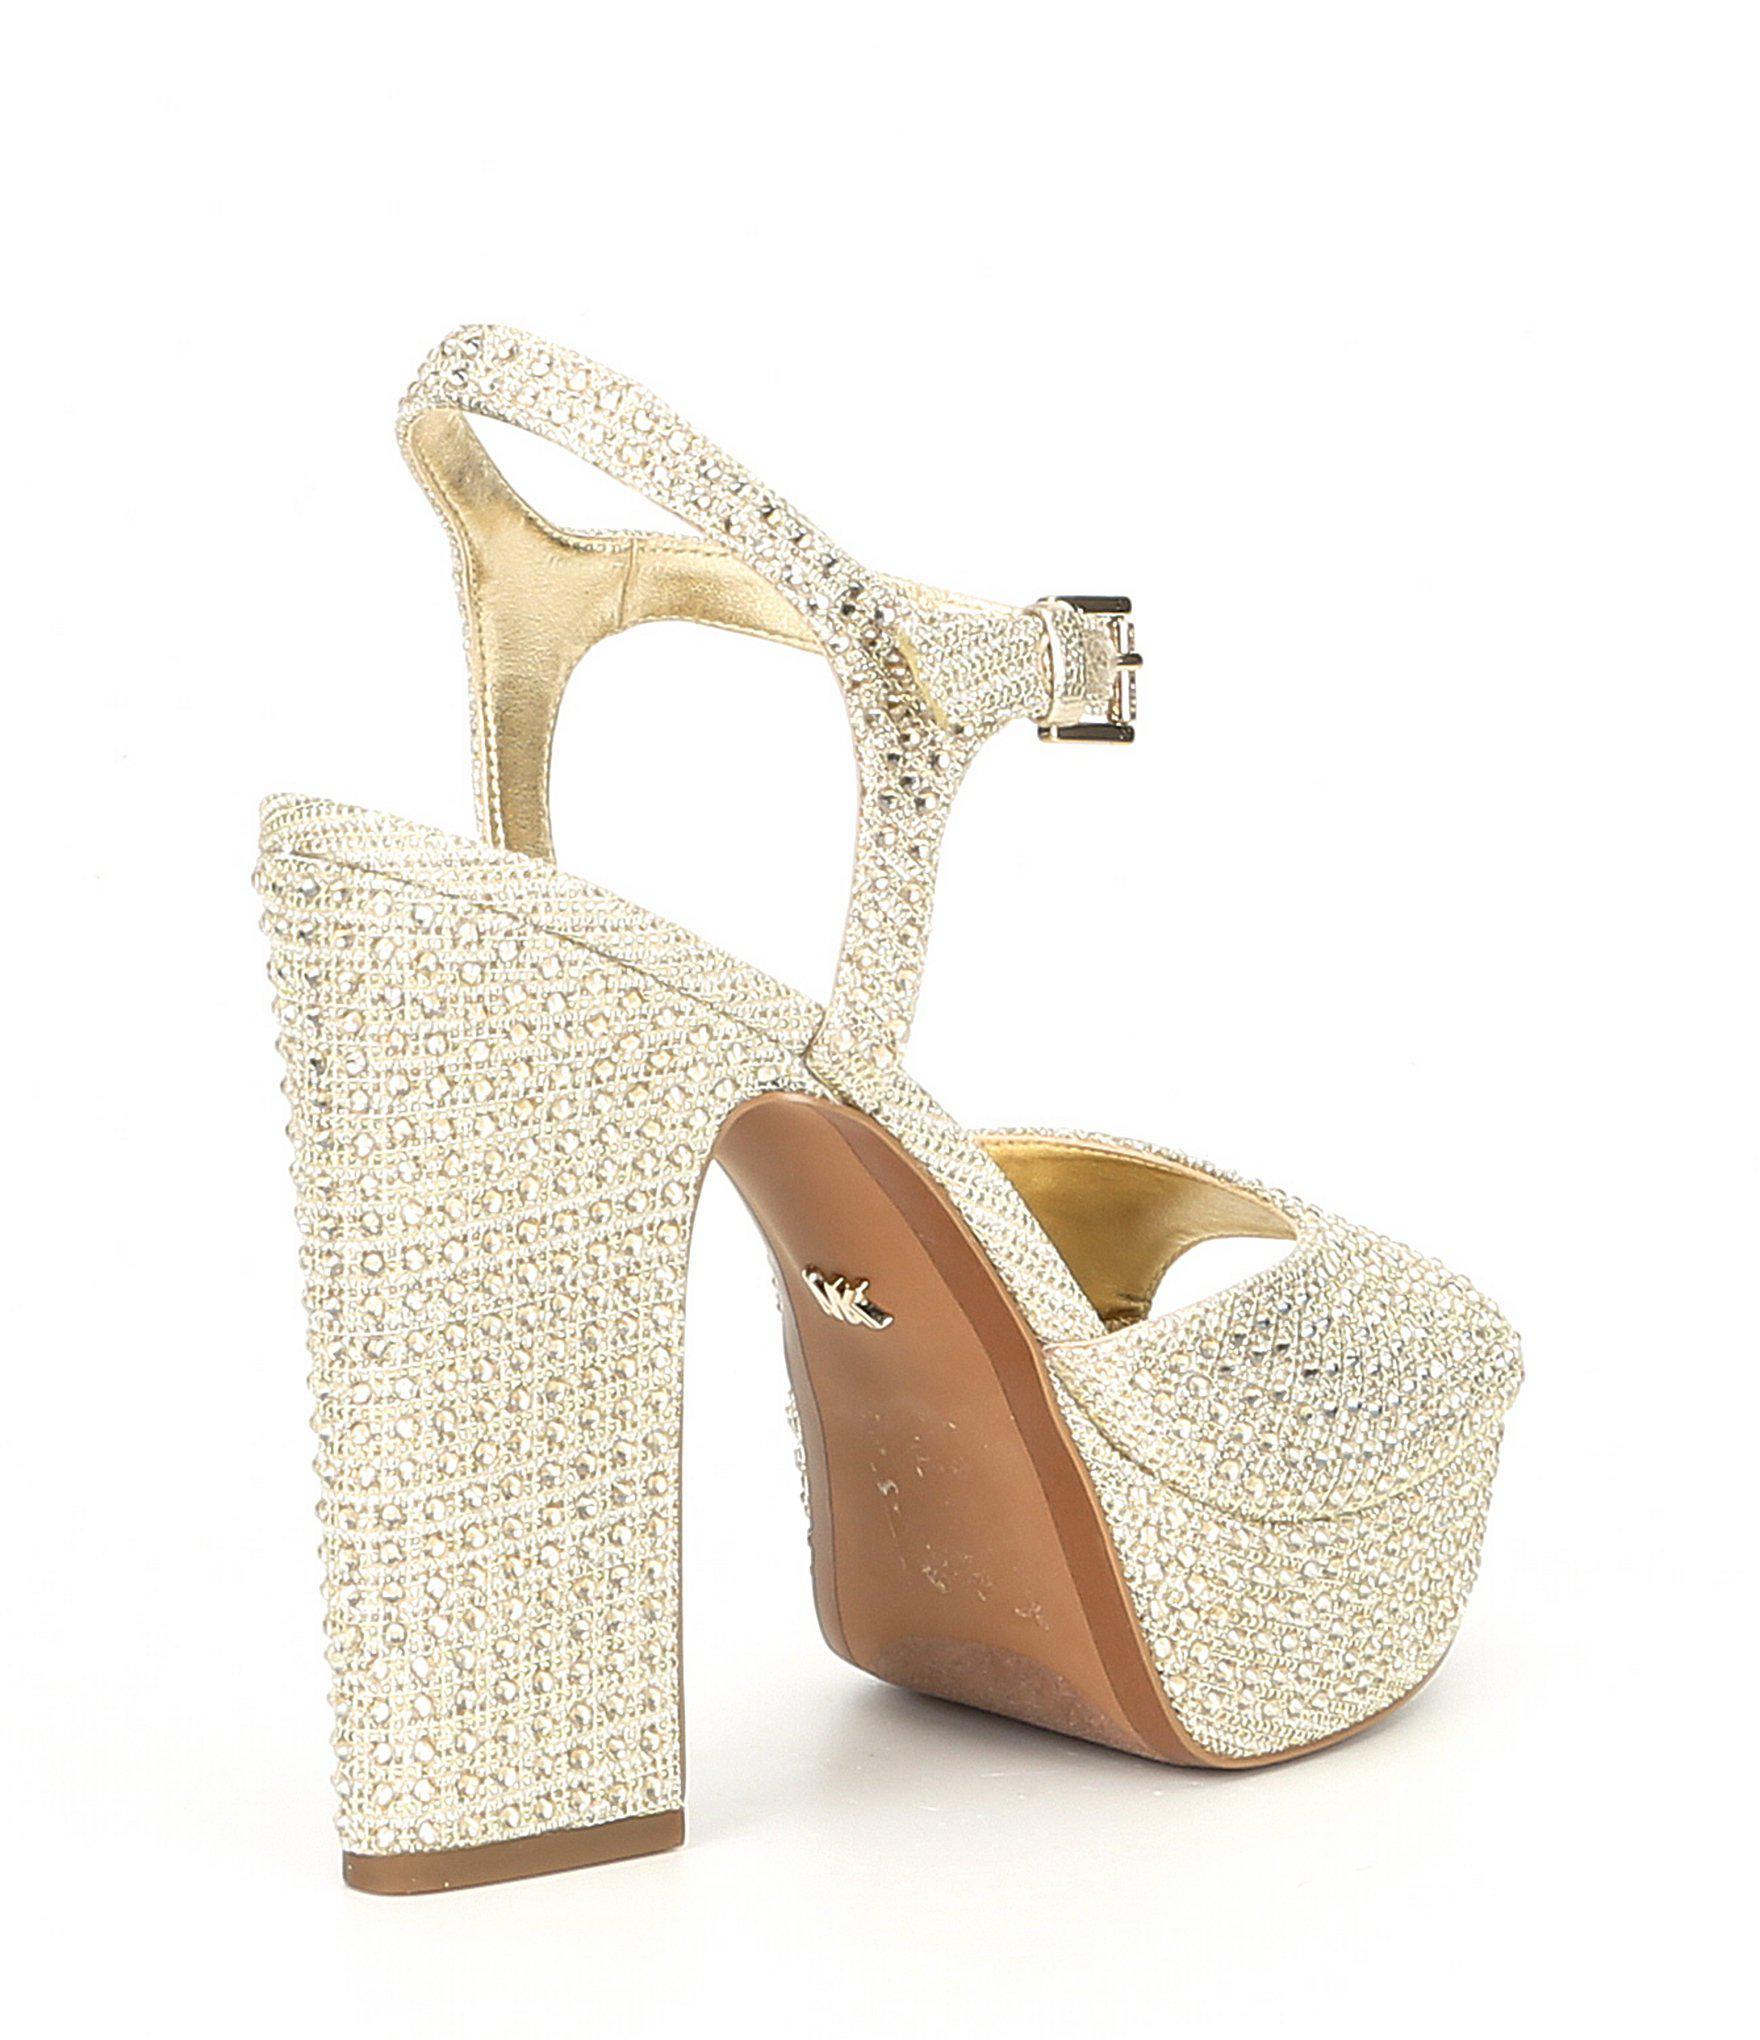 5deb20588bab Lyst - MICHAEL Michael Kors Bennett Platform Sandals in Metallic